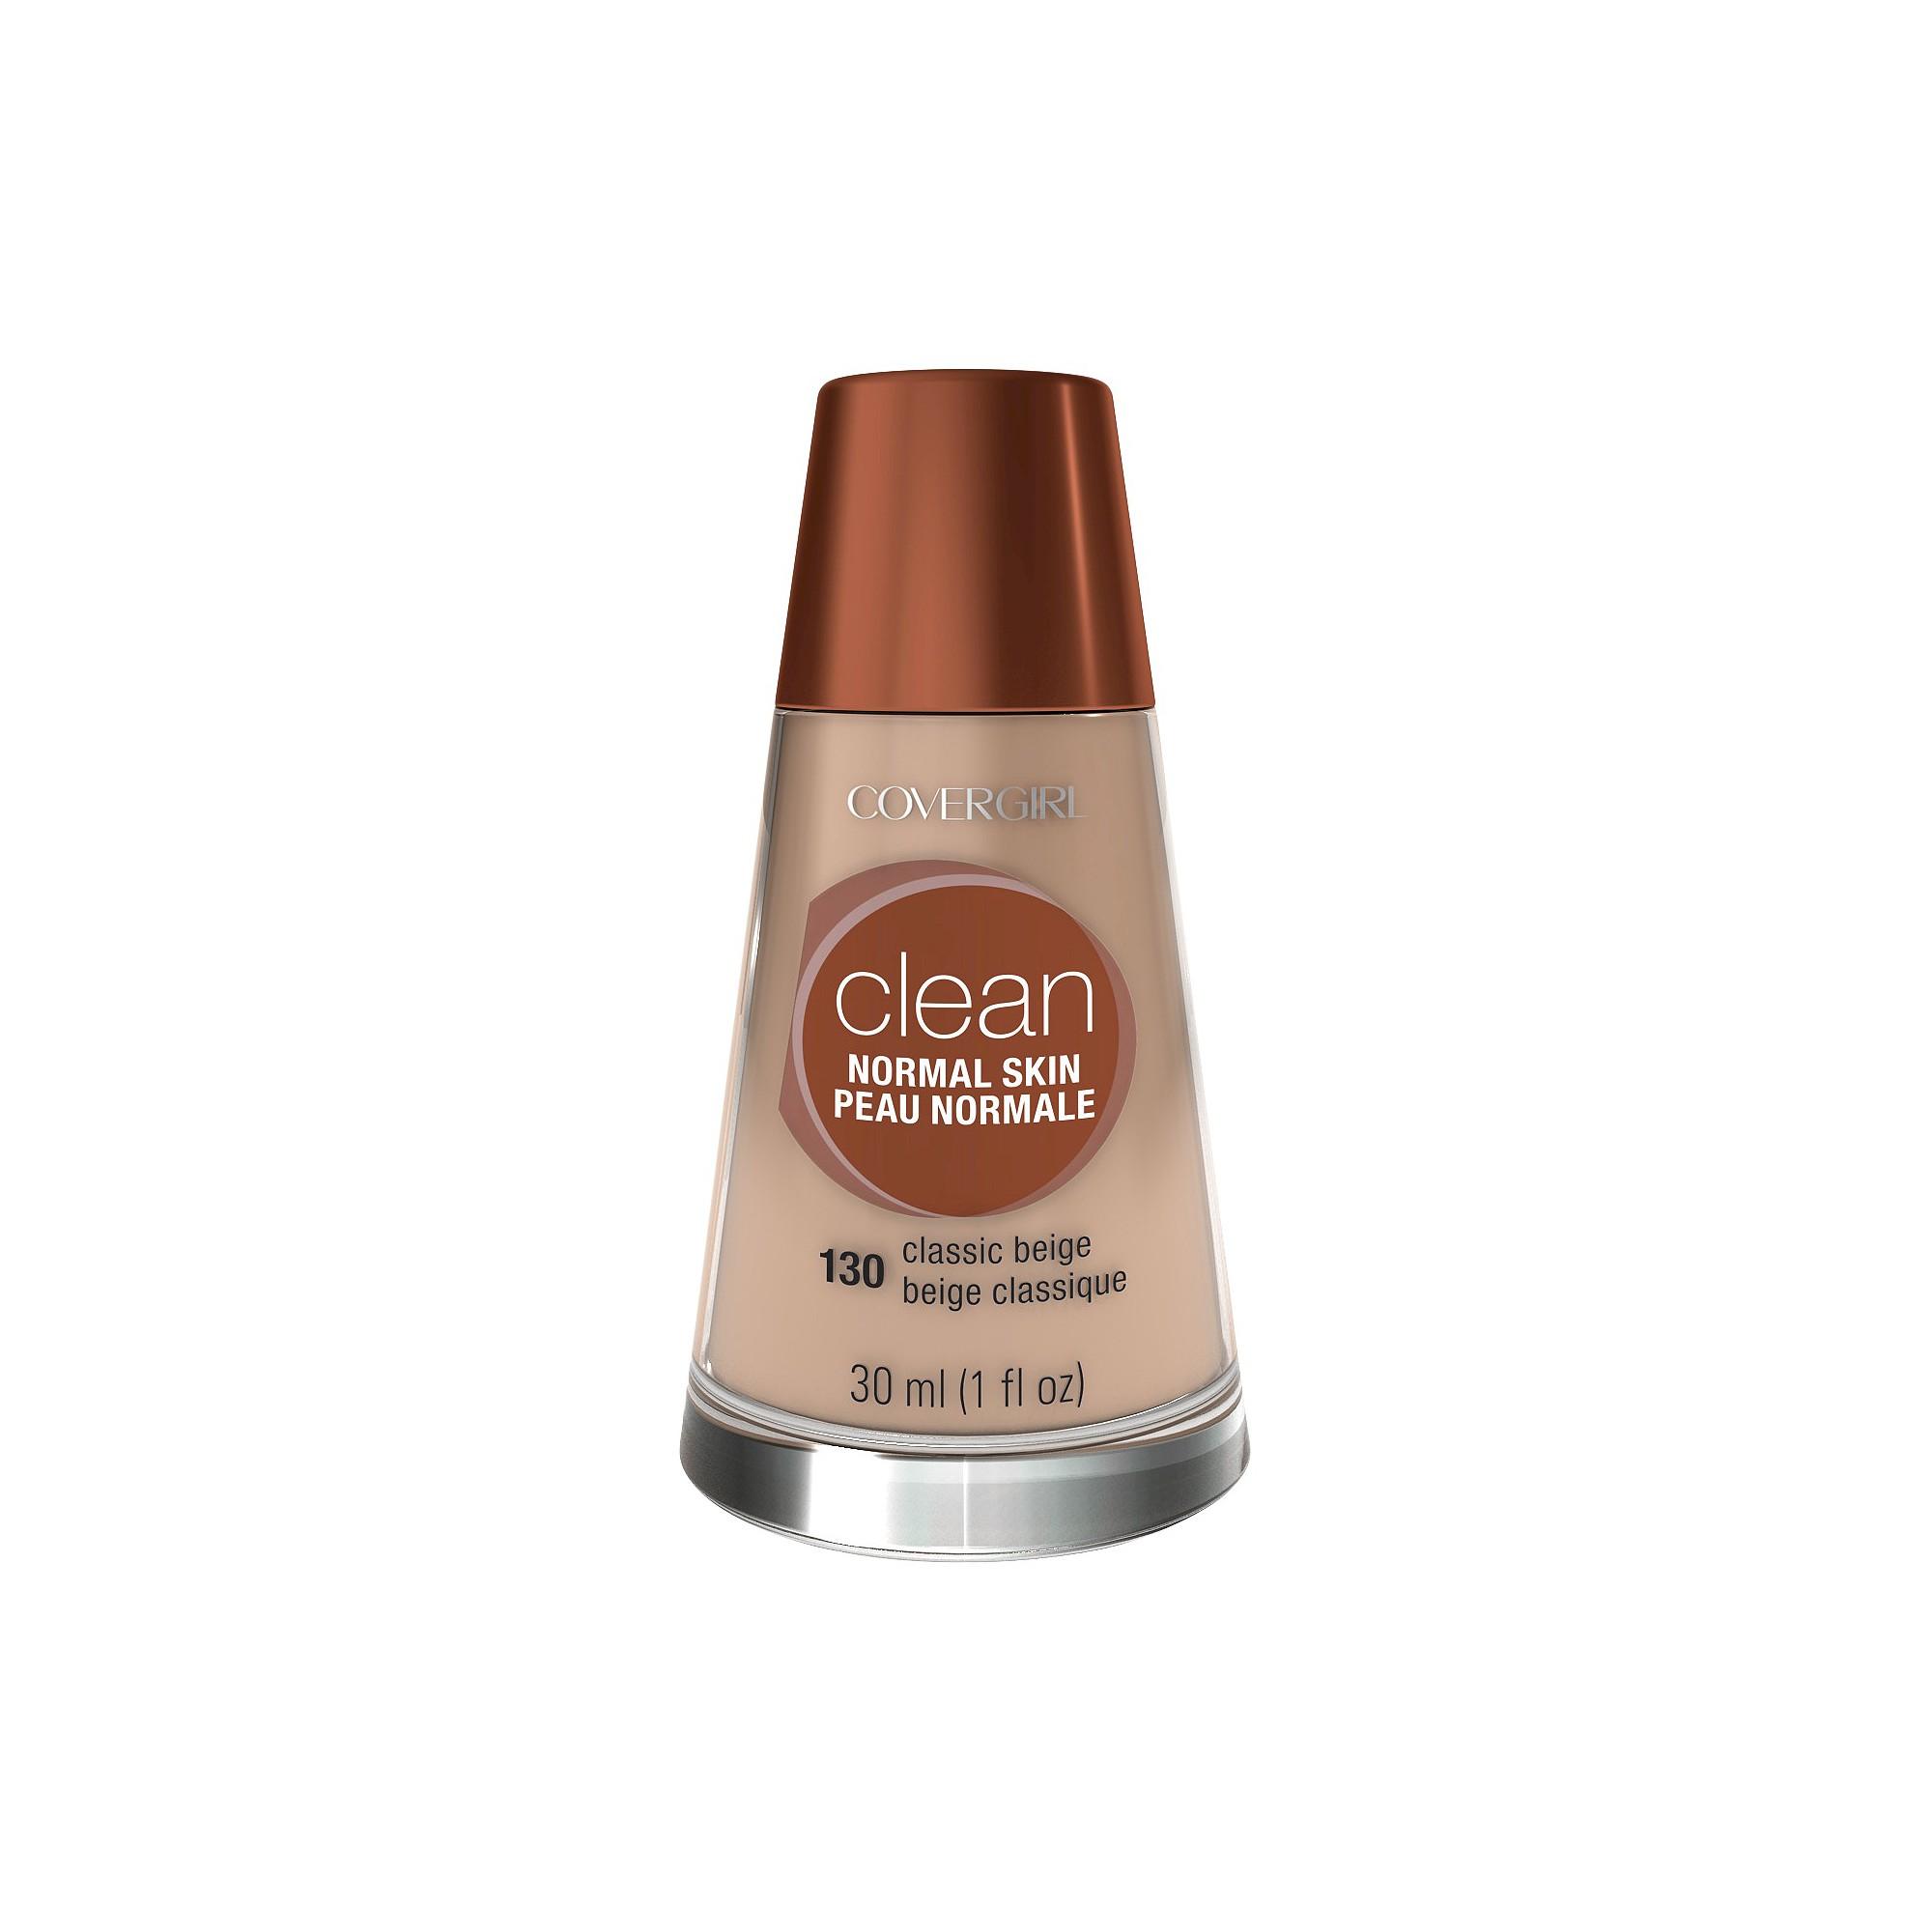 COVERGIRL Clean Foundation 130 Classic Beige 1 fl oz